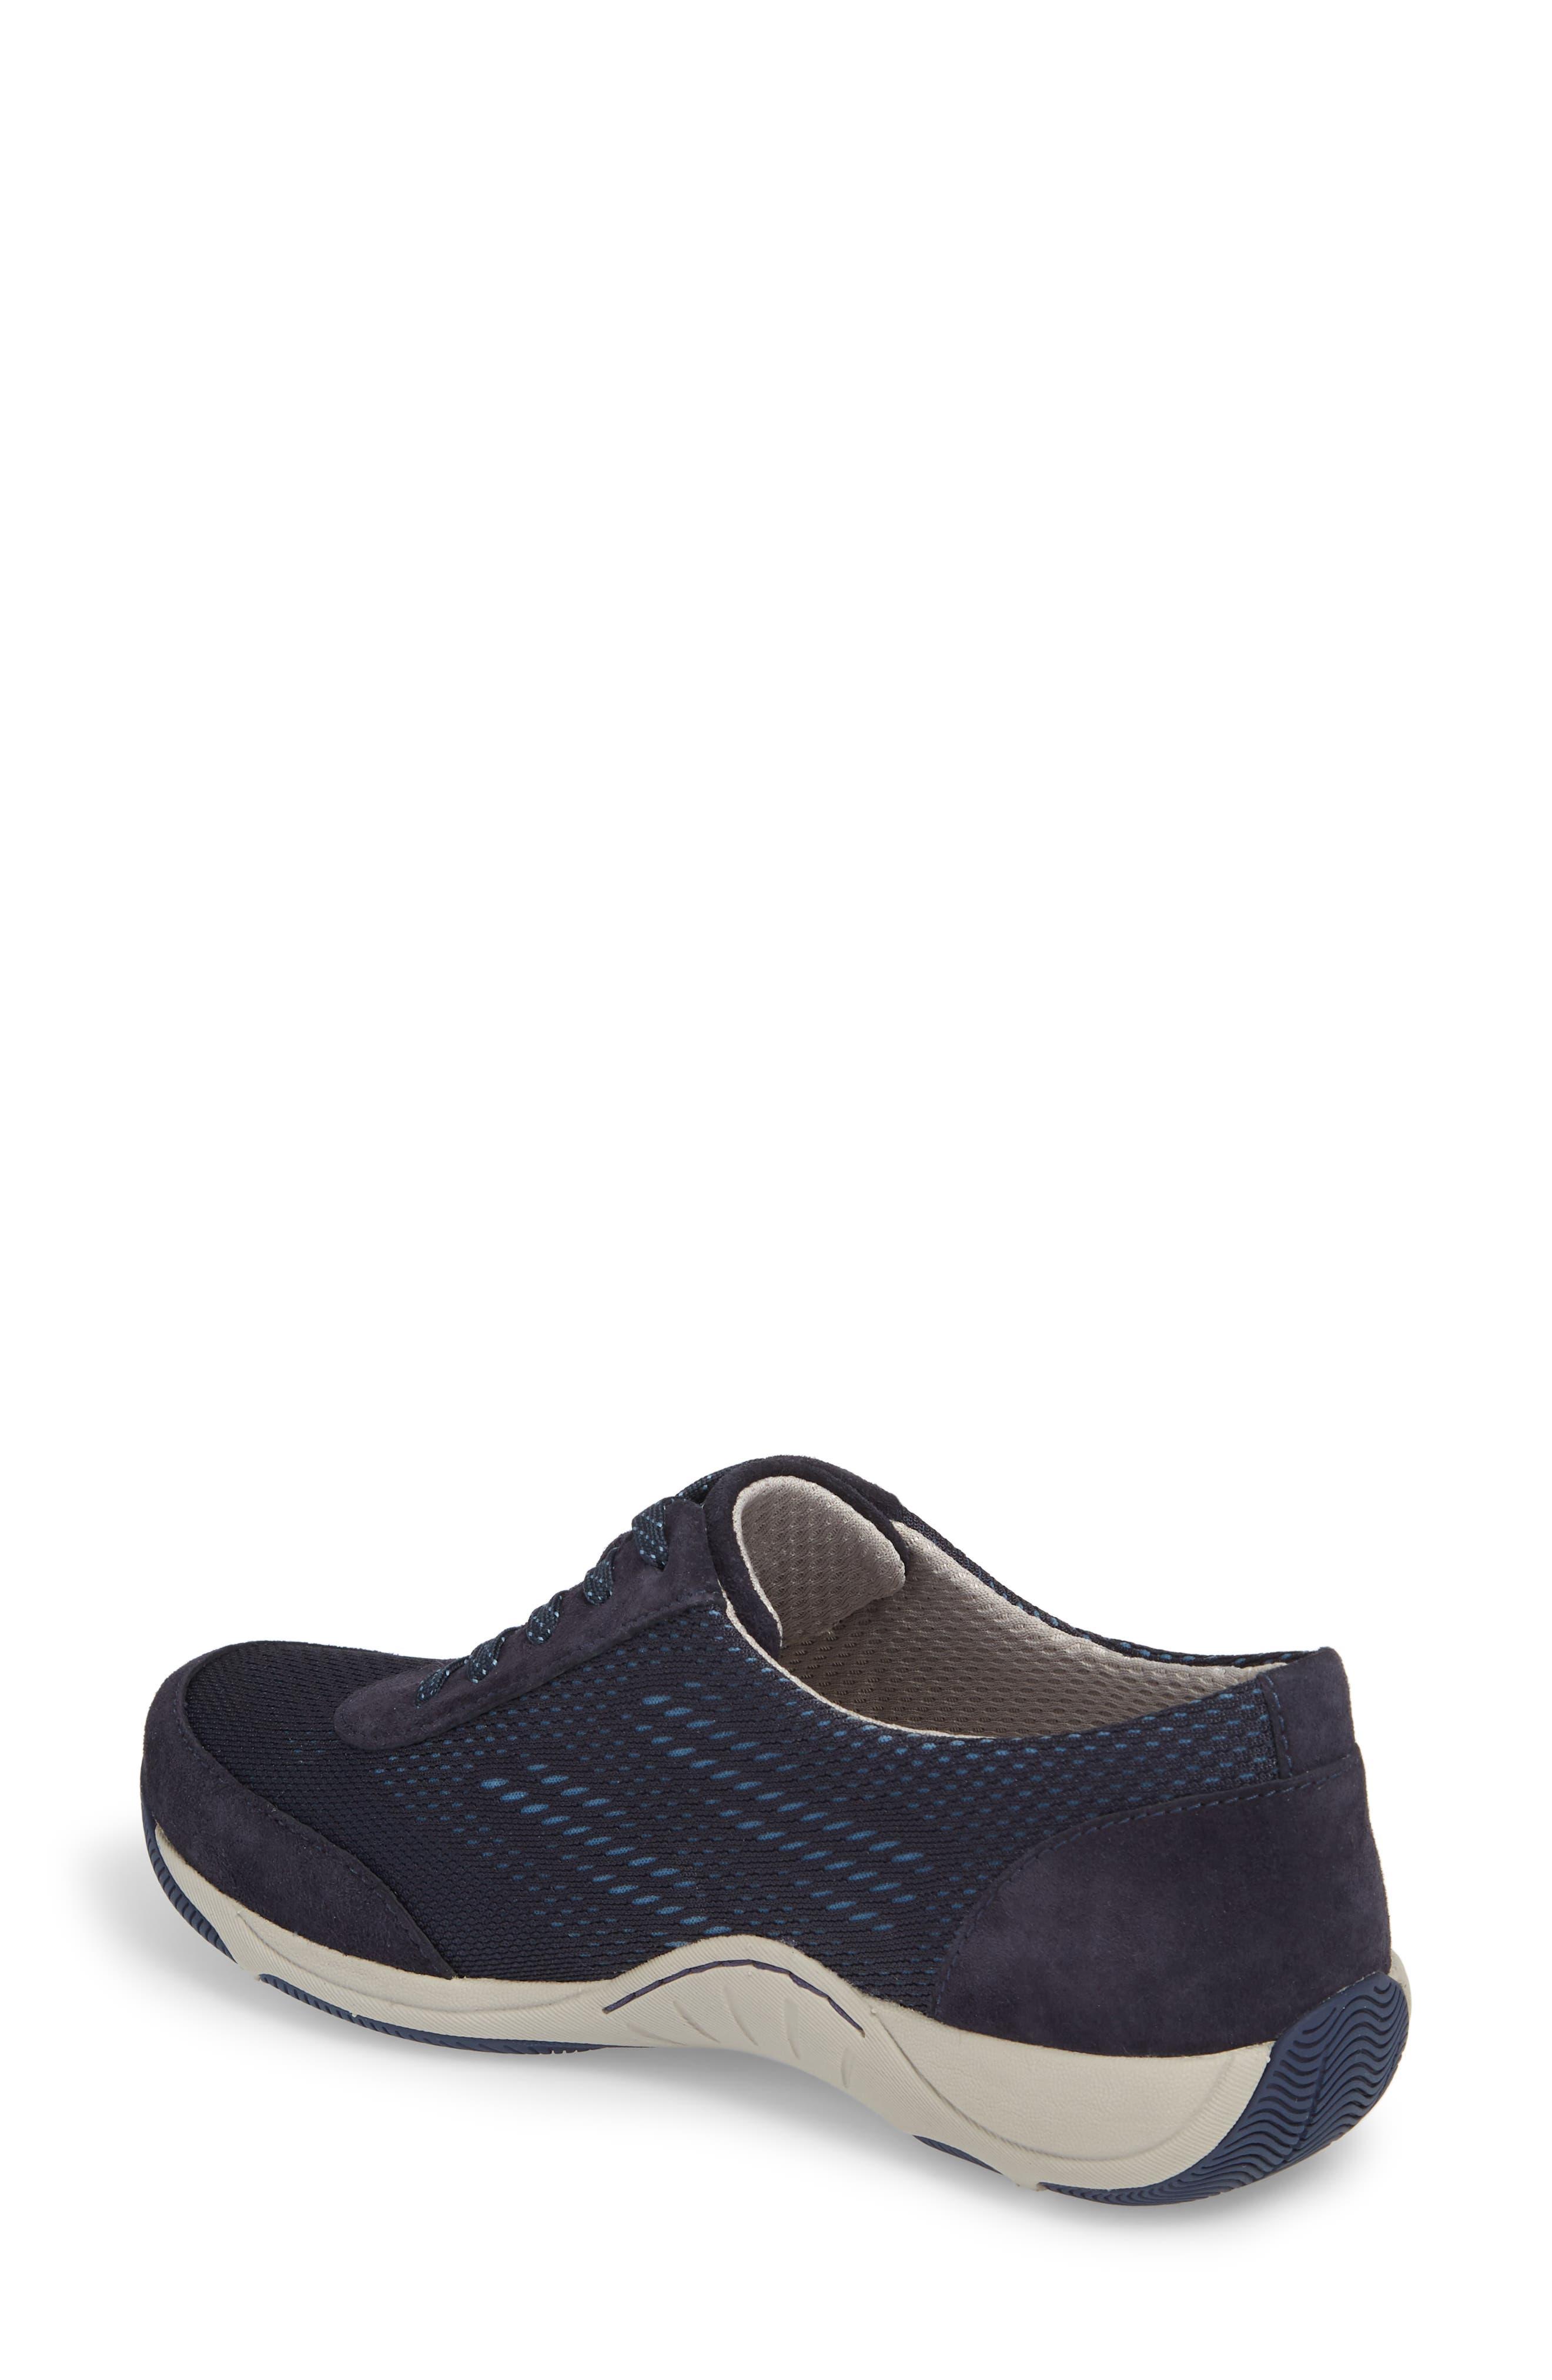 Hayes Sneaker,                             Alternate thumbnail 9, color,